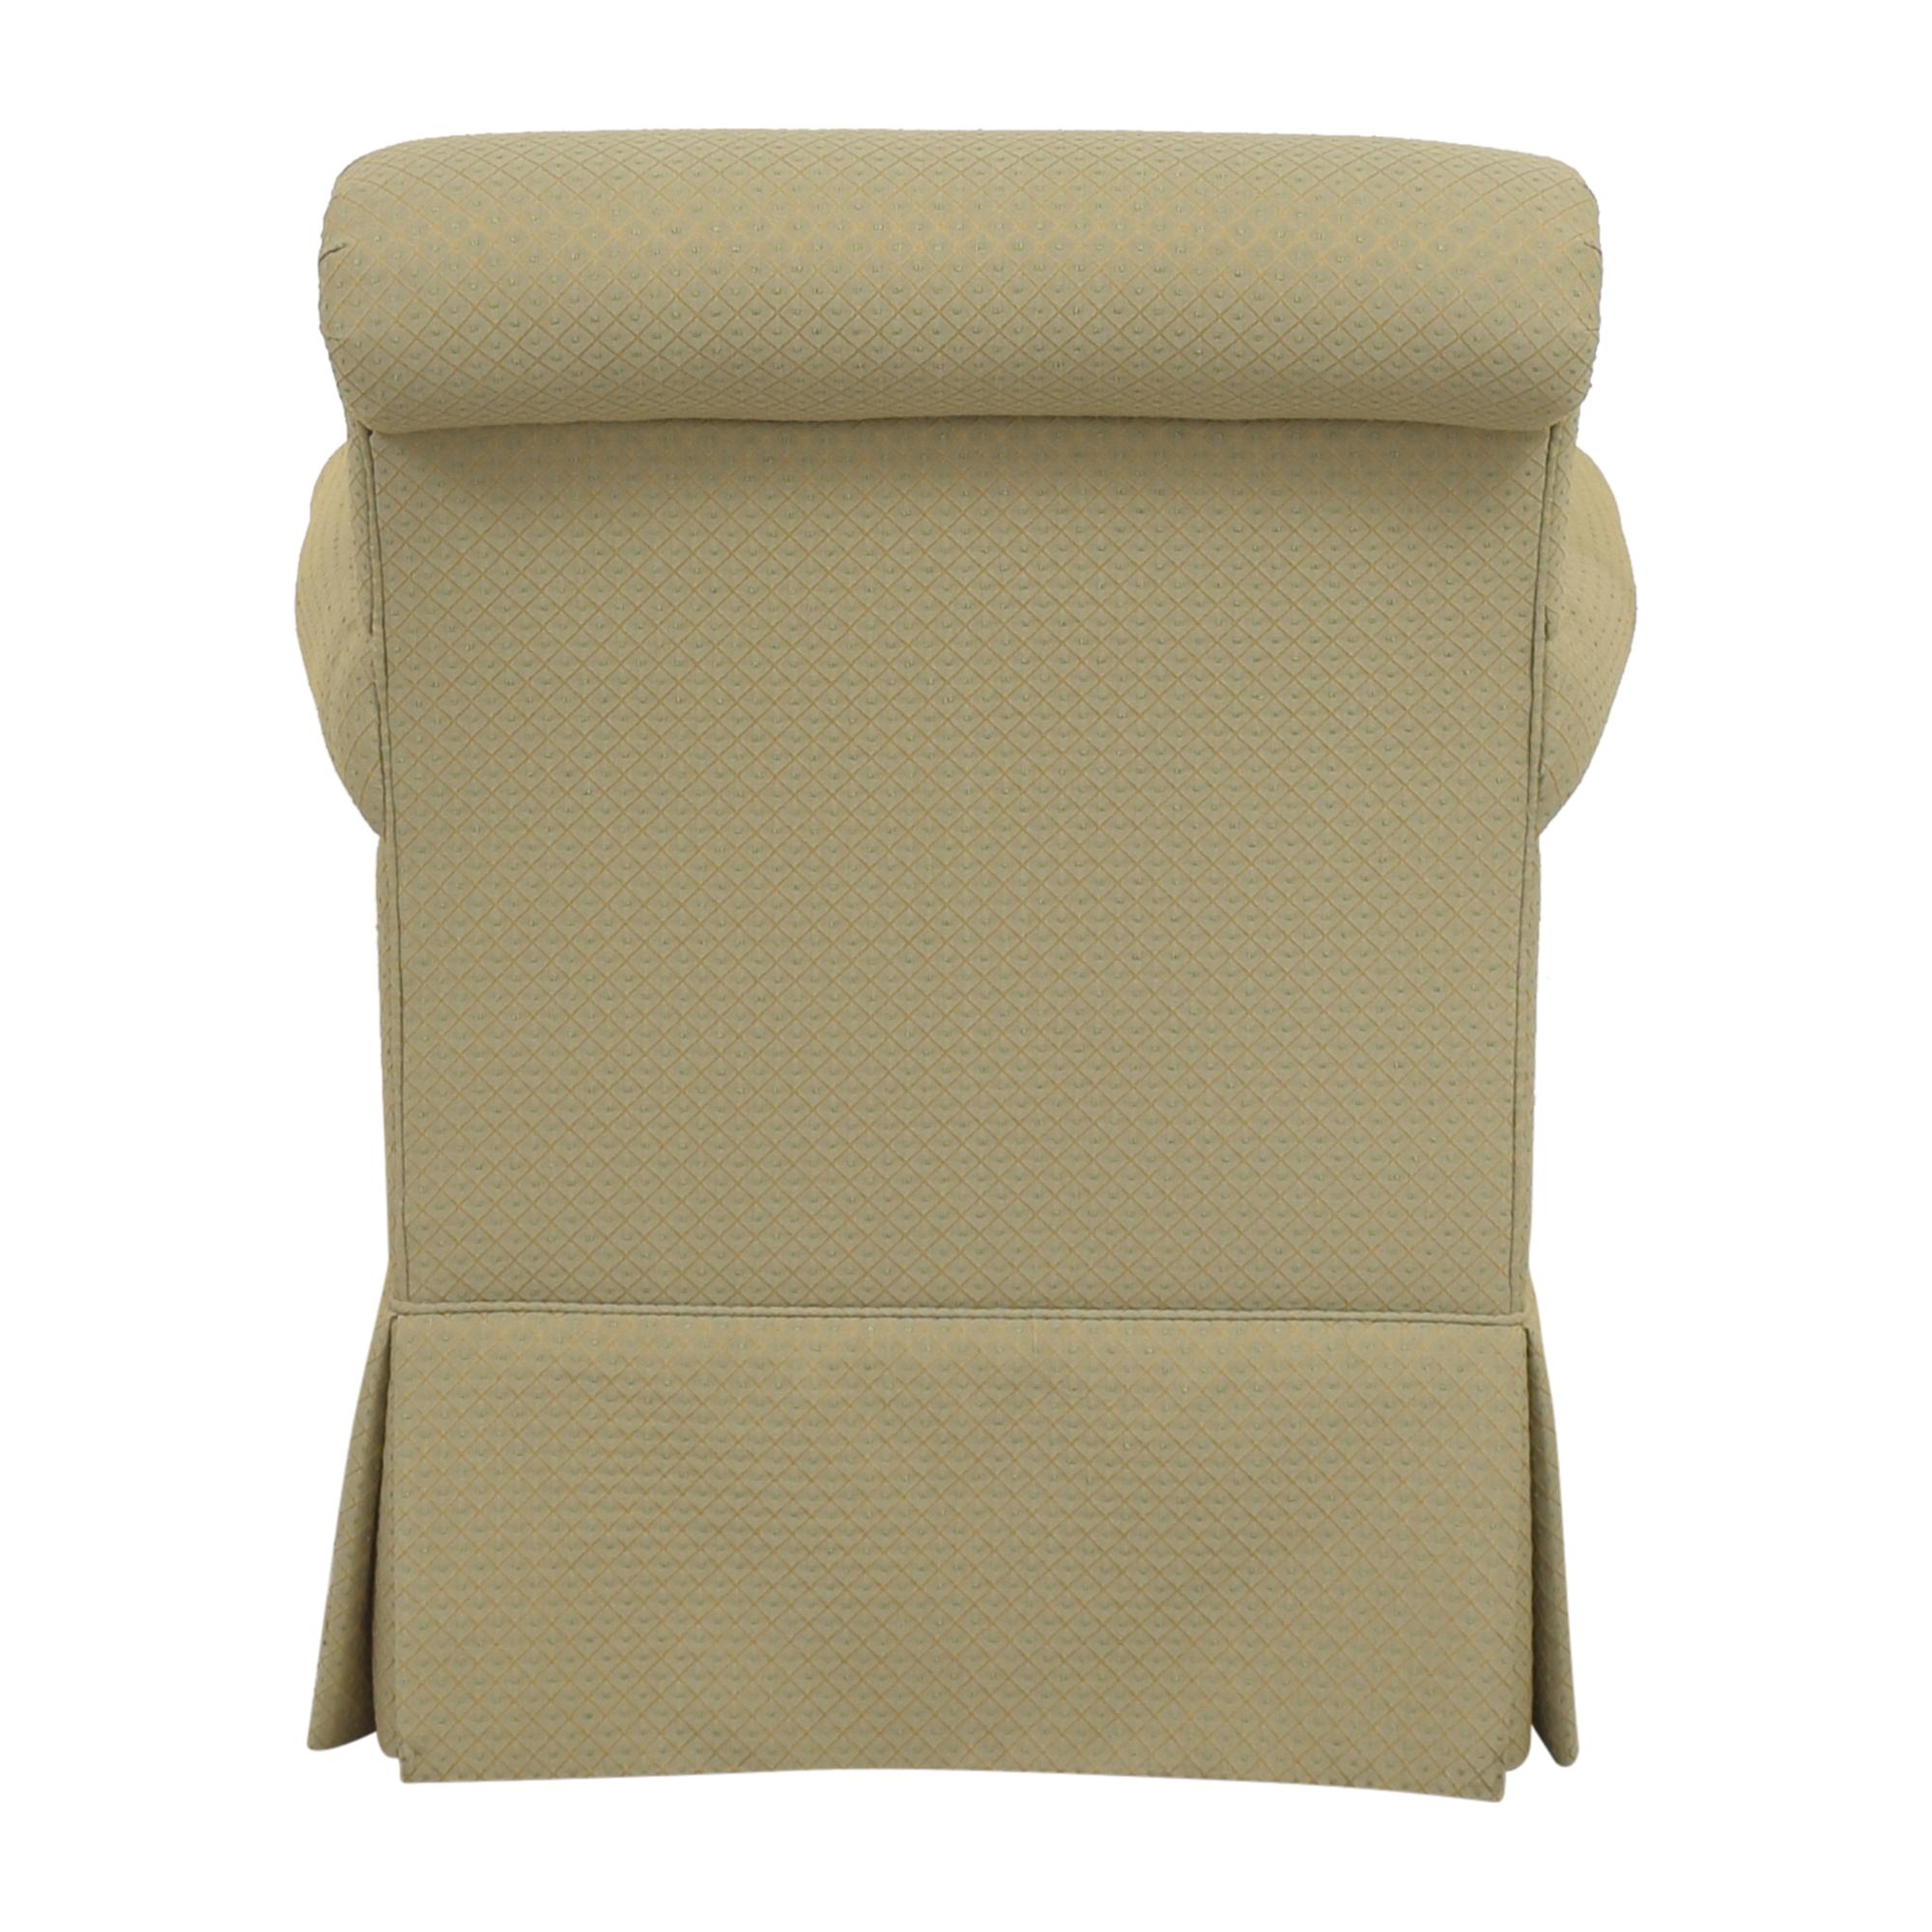 shop Ethan Allen Skirted Accent Chair Ethan Allen Accent Chairs